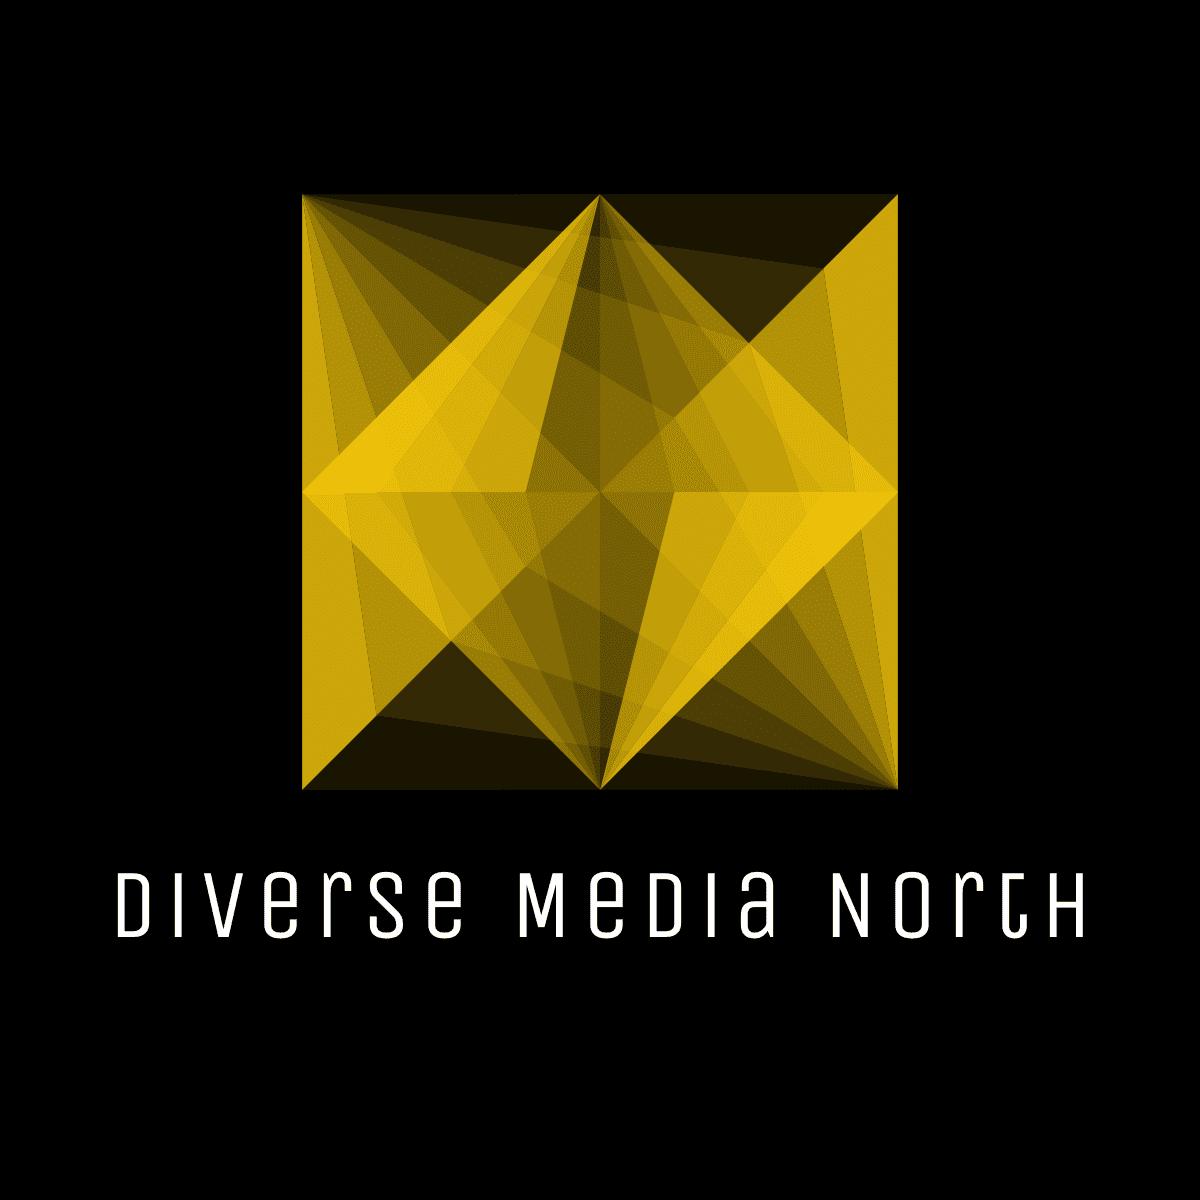 DIVERSE MEDIA NORTH